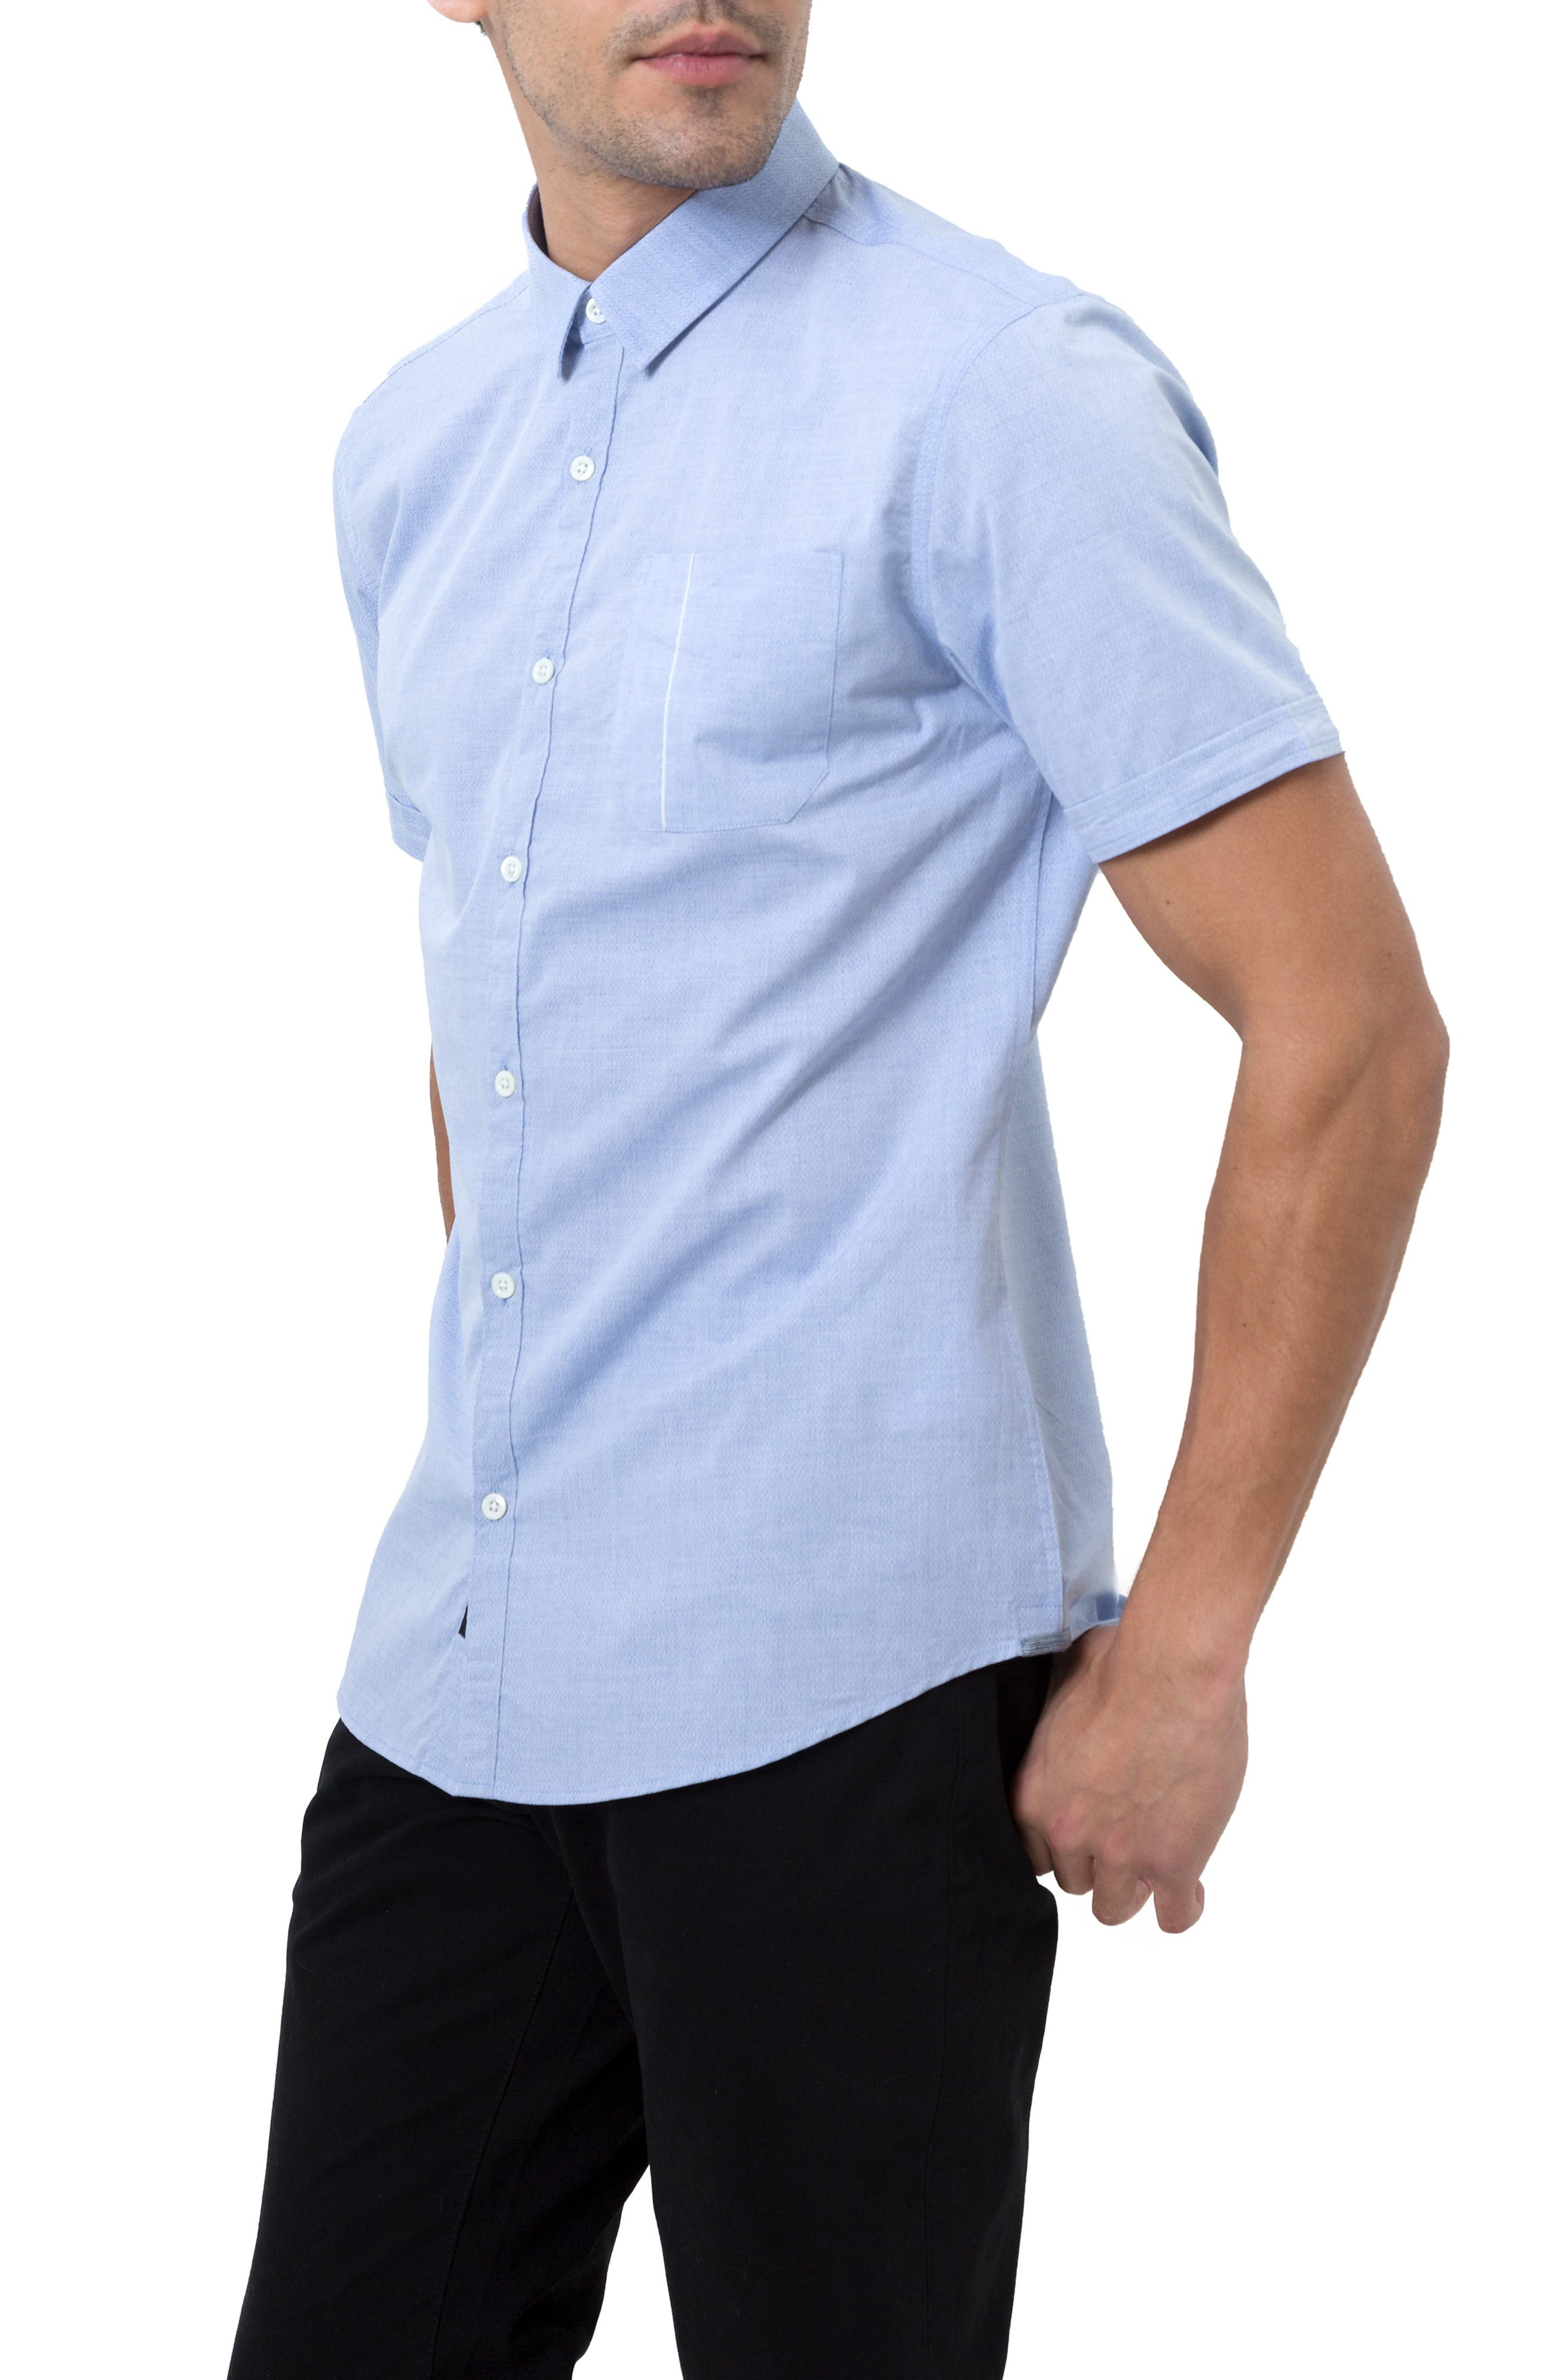 Smile Away Trim Fit Sport Shirt,                             Alternate thumbnail 4, color,                             LIGHT BLUE